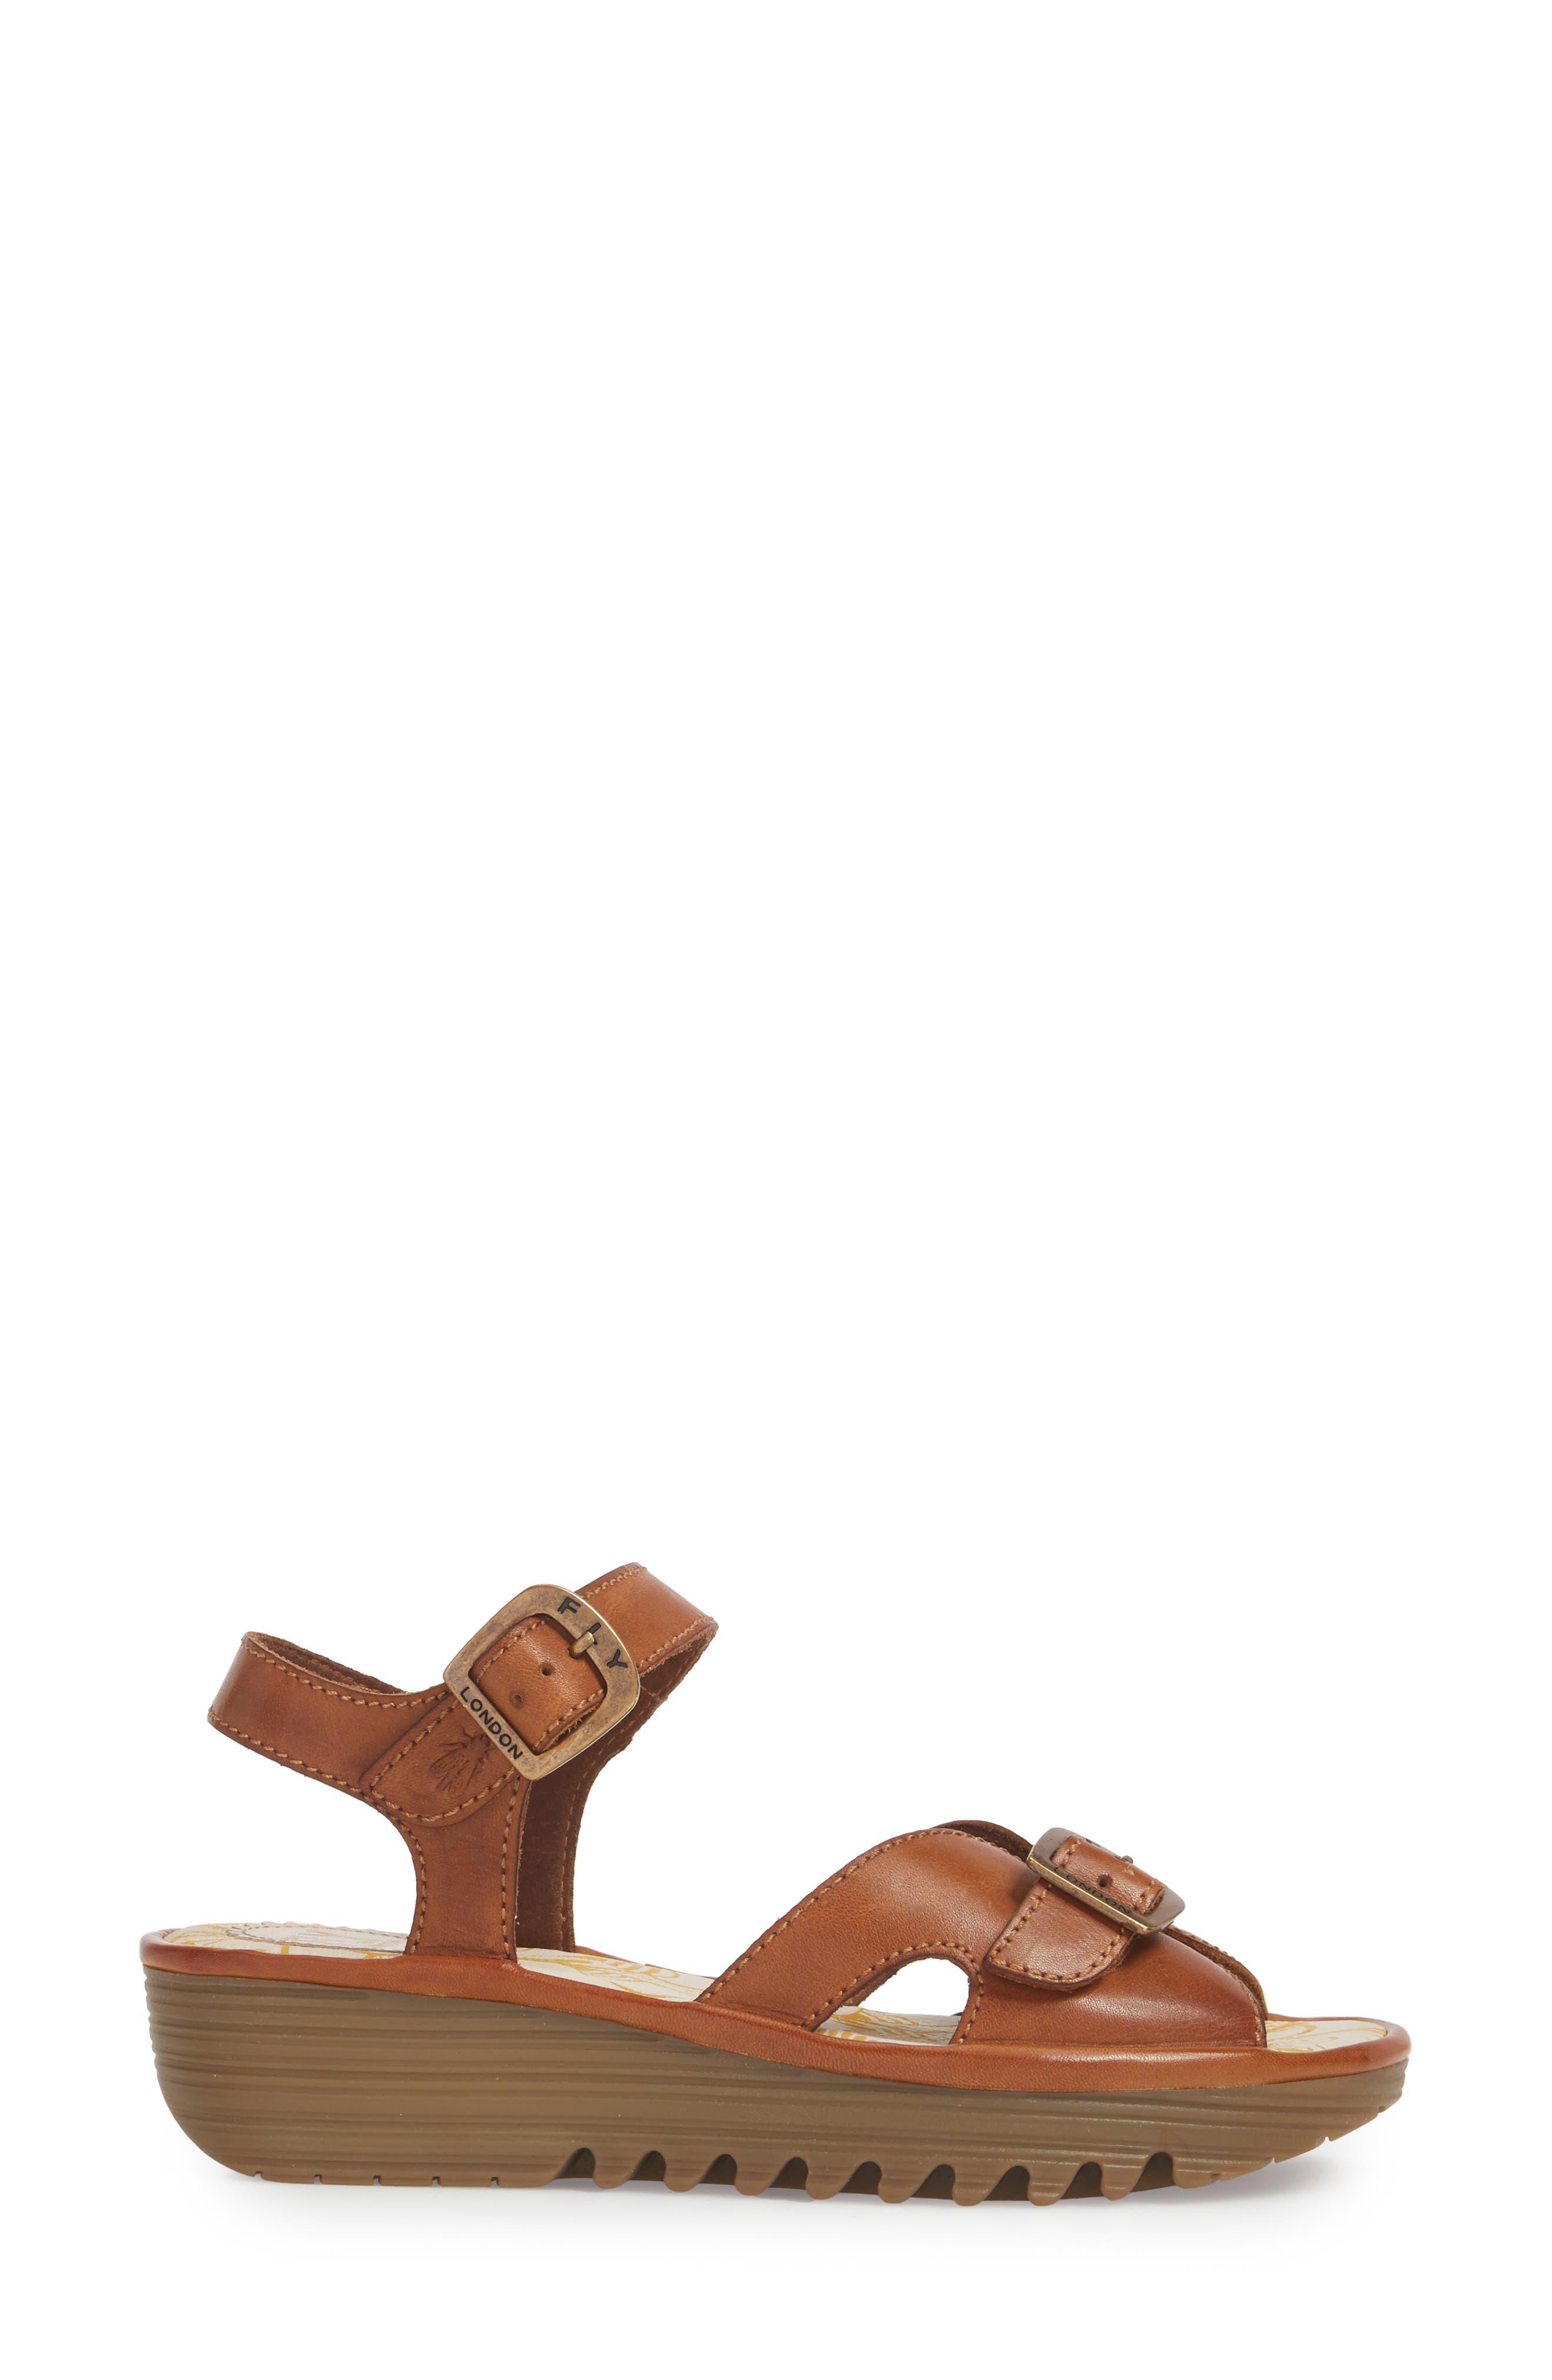 Egal Sandal,                             Alternate thumbnail 3, color,                             Tan Colmar Leather